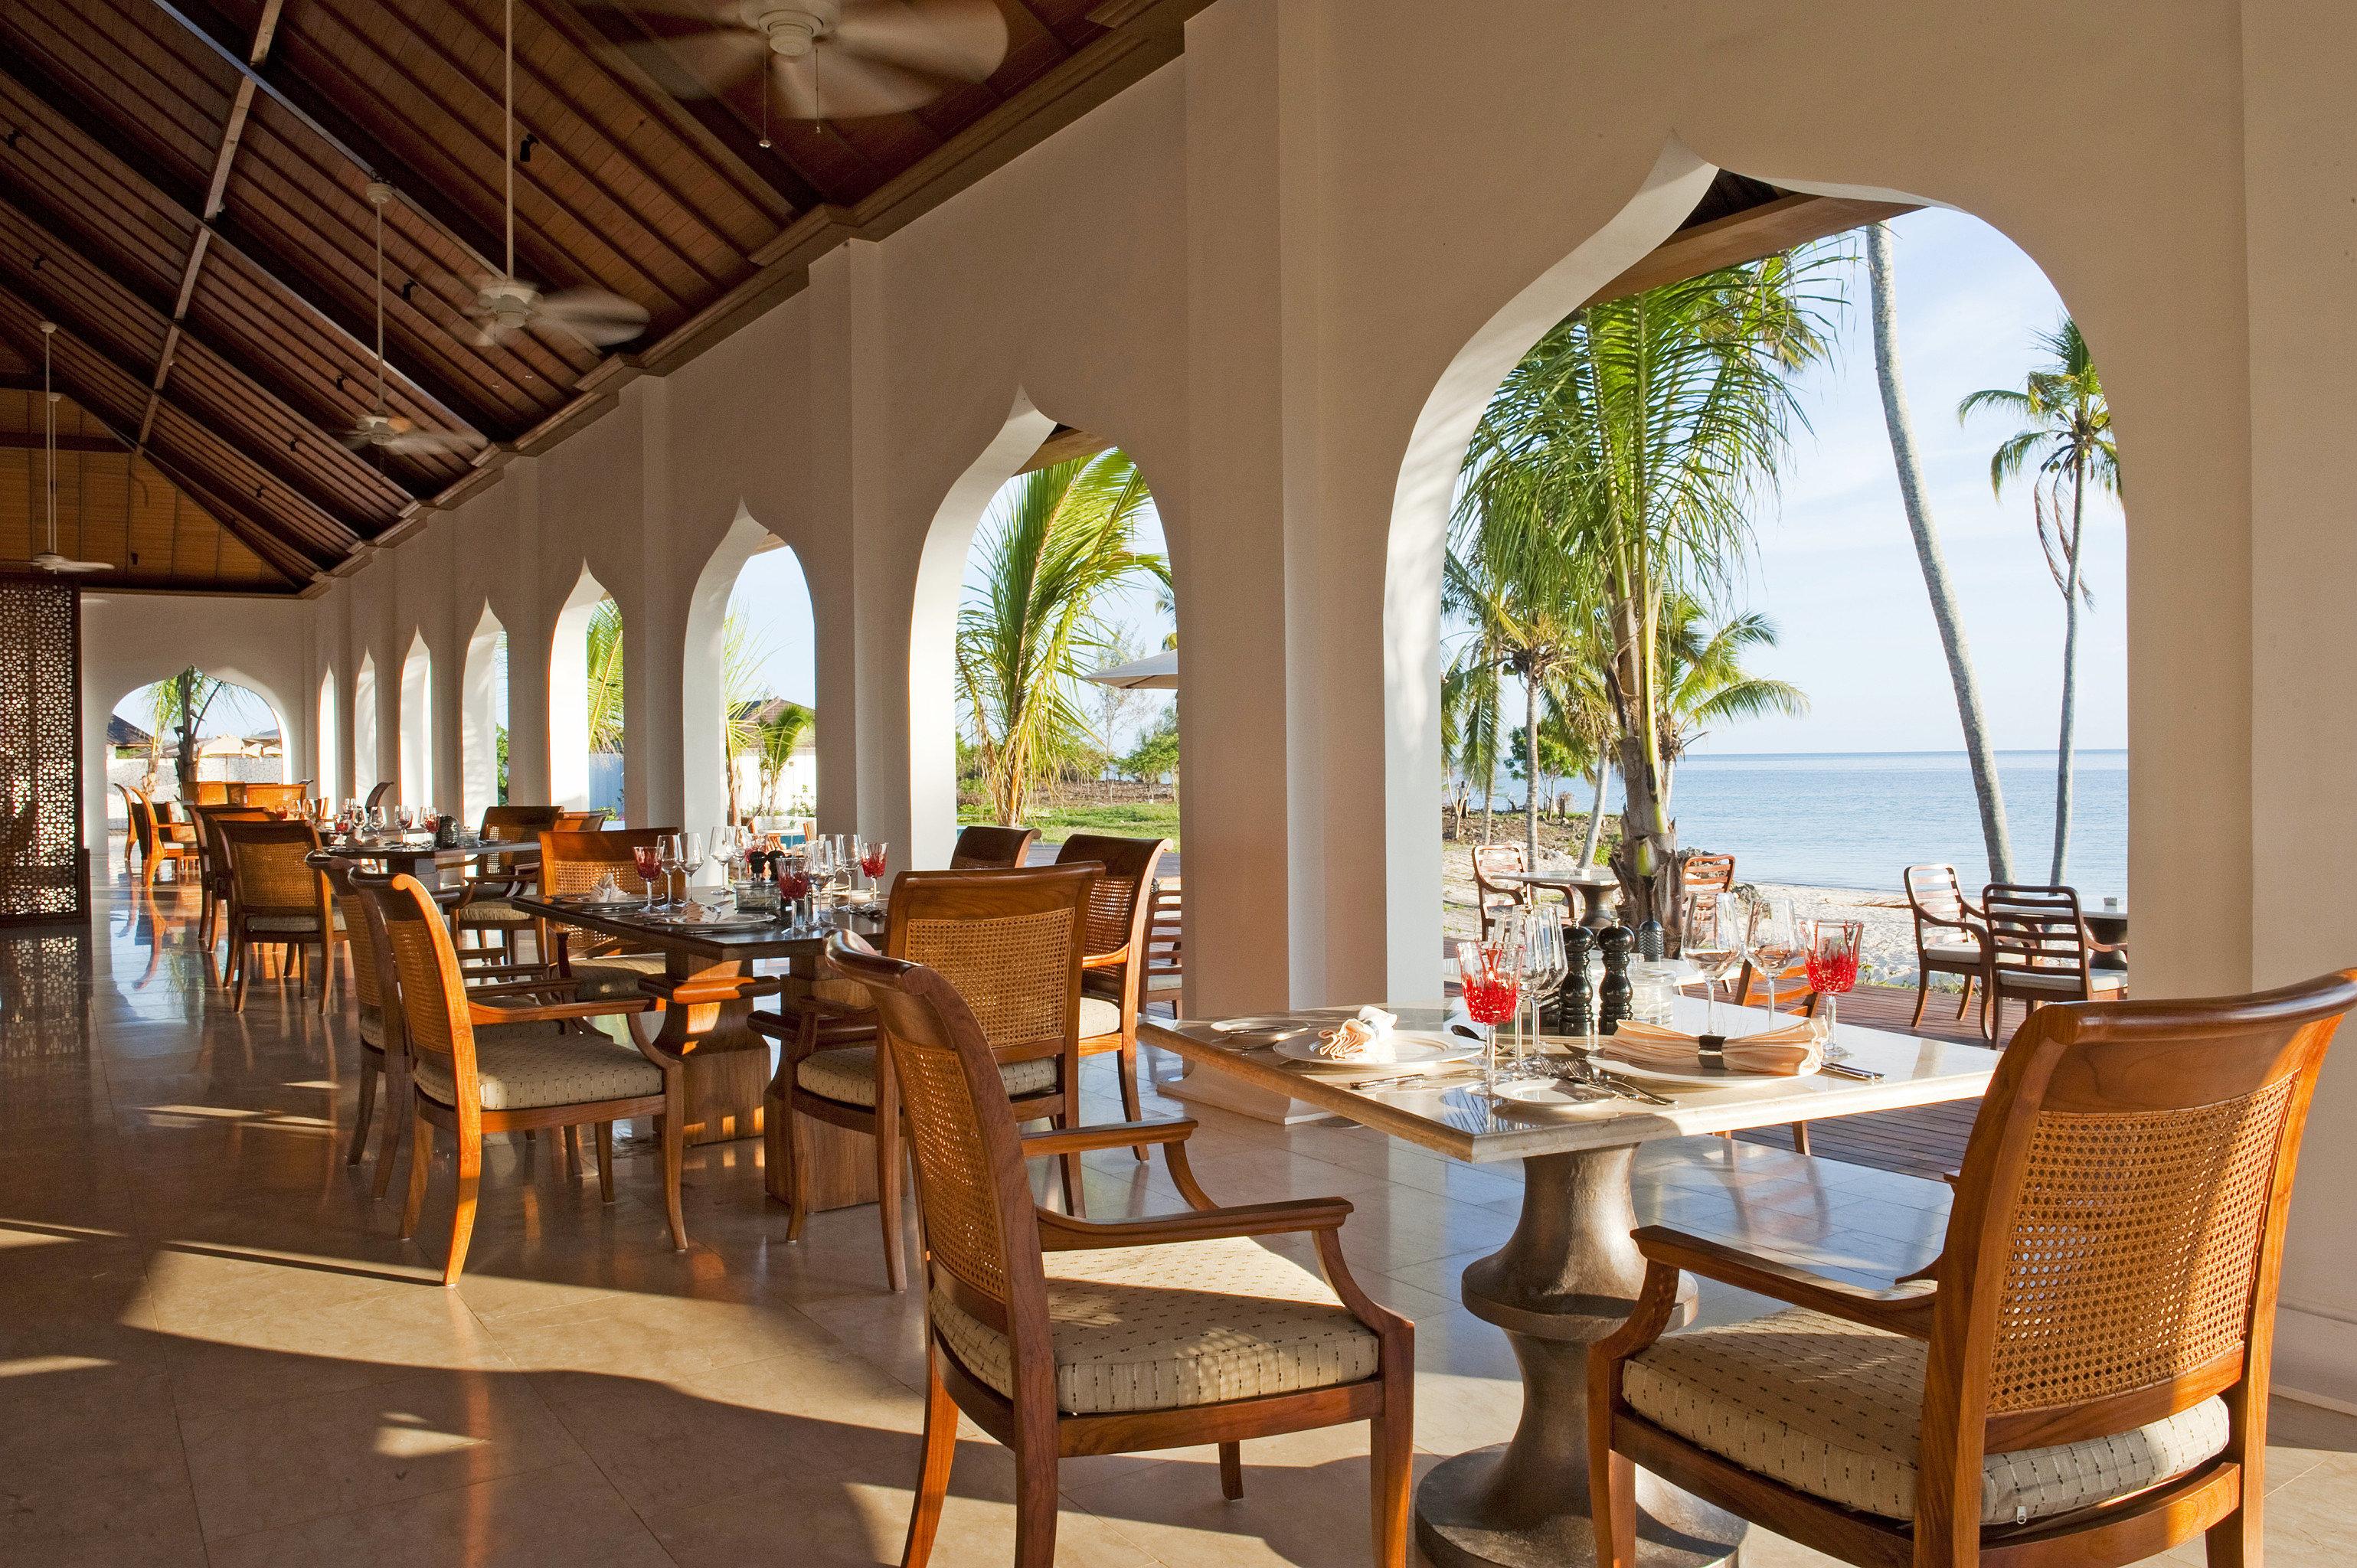 Beachfront Dining Drink Eat Family Luxury Patio Resort Scenic views property chair restaurant home Villa function hall hacienda